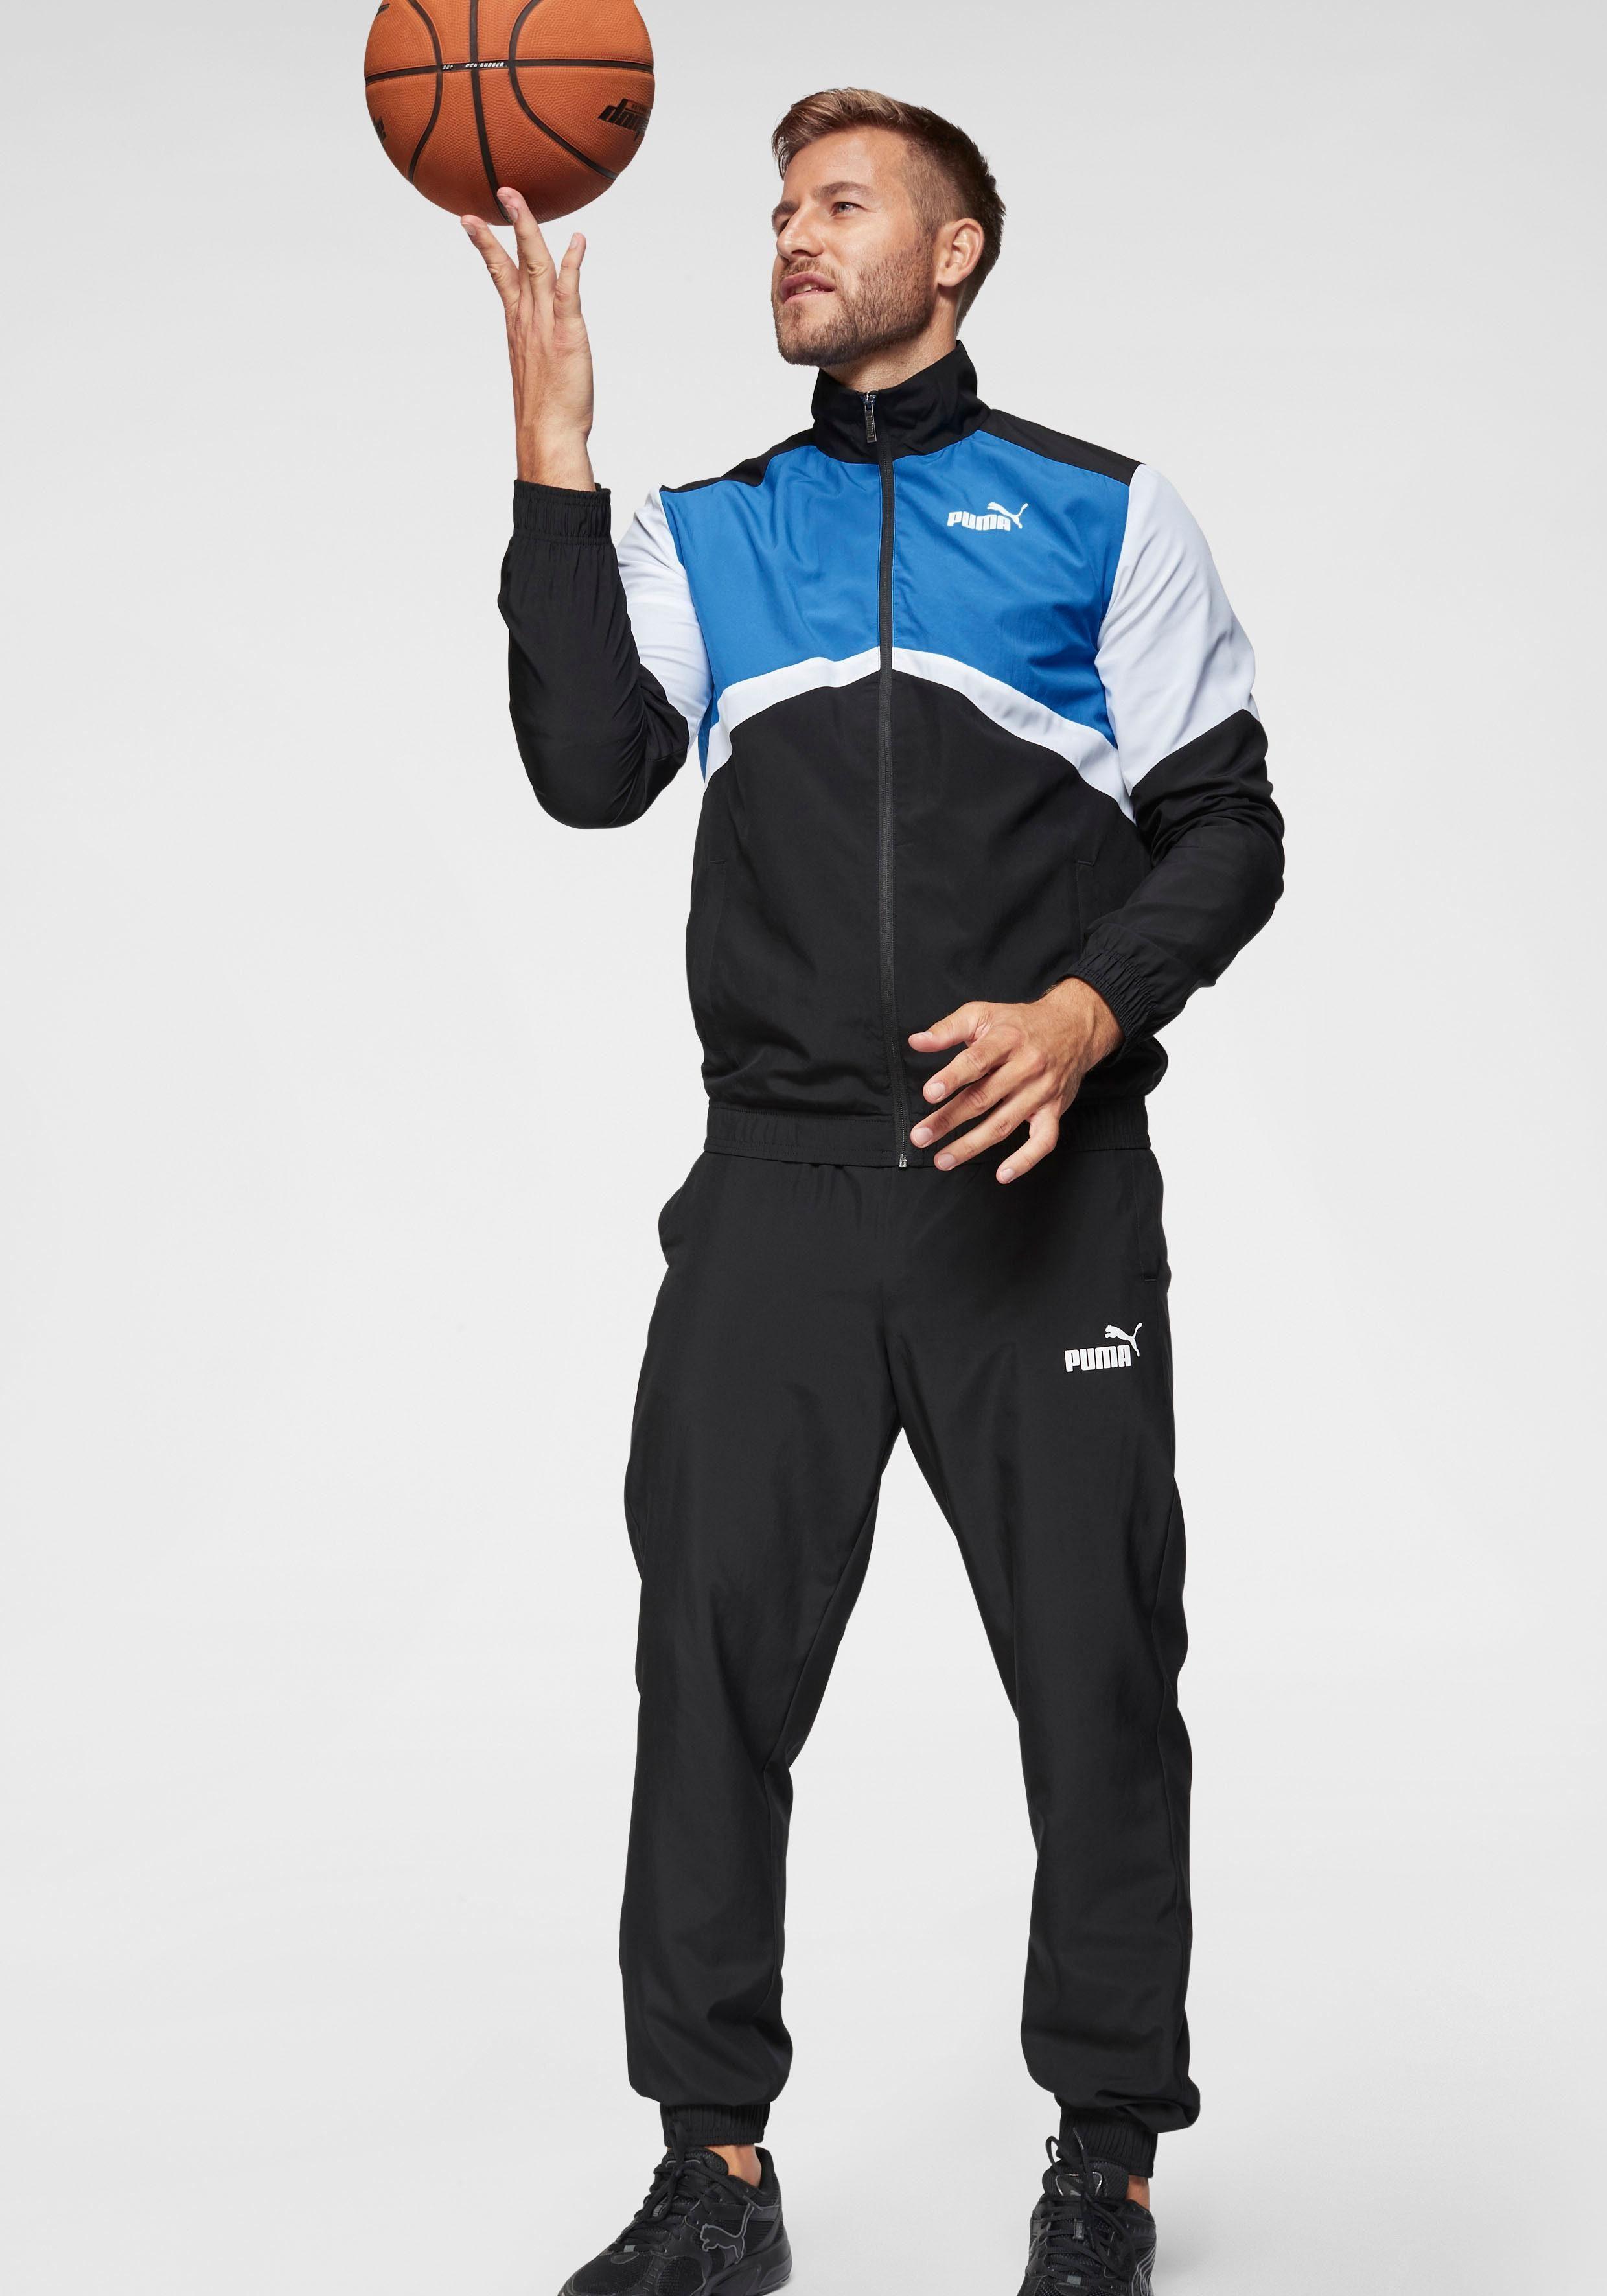 Puma CB Retro Jogginganzug Herren | sieger preise